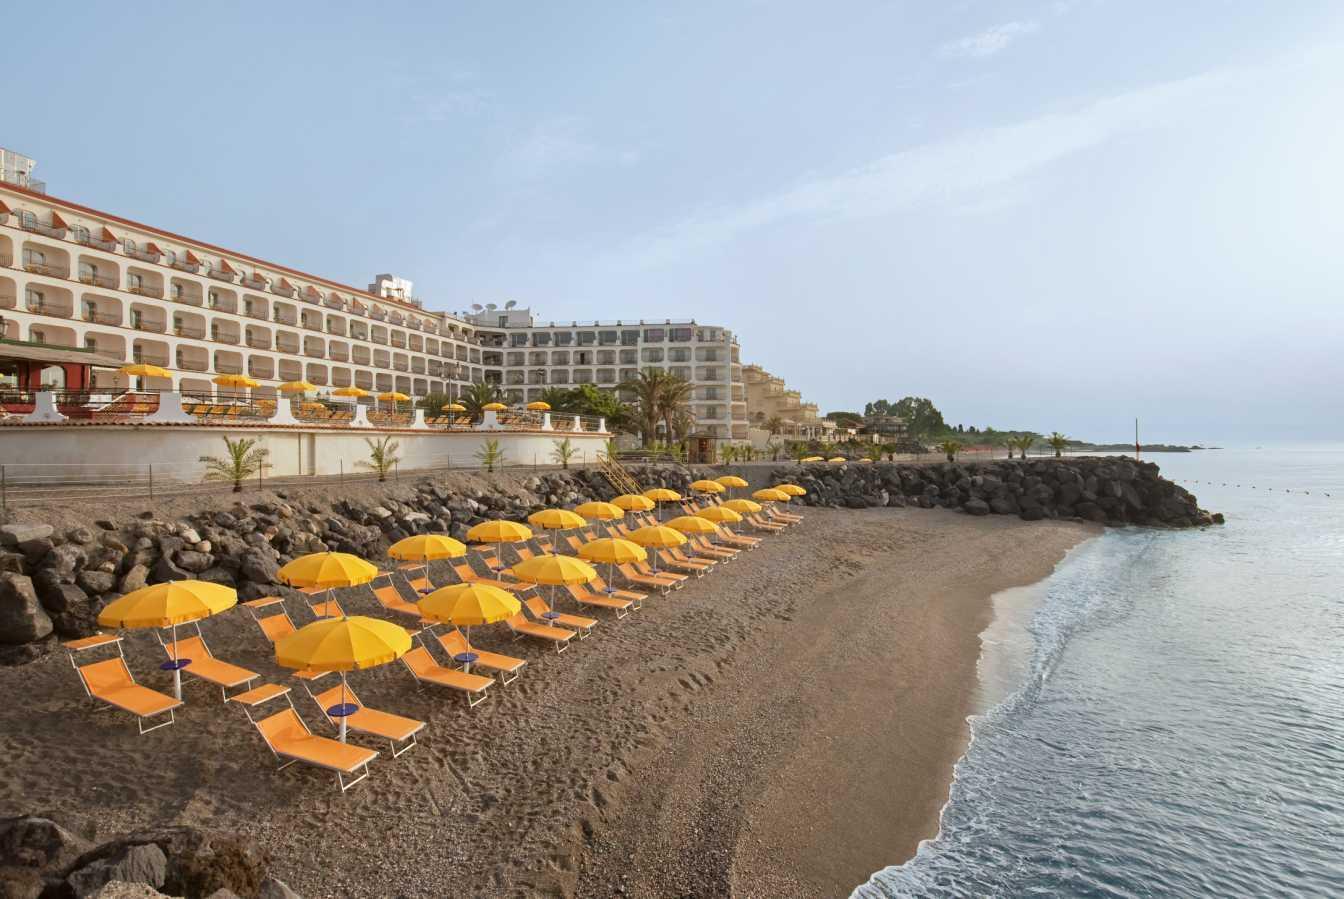 Hotel a giardini naxos da 26 notte cerca hotel su kayak - Hotel giardini naxos 3 stelle ...